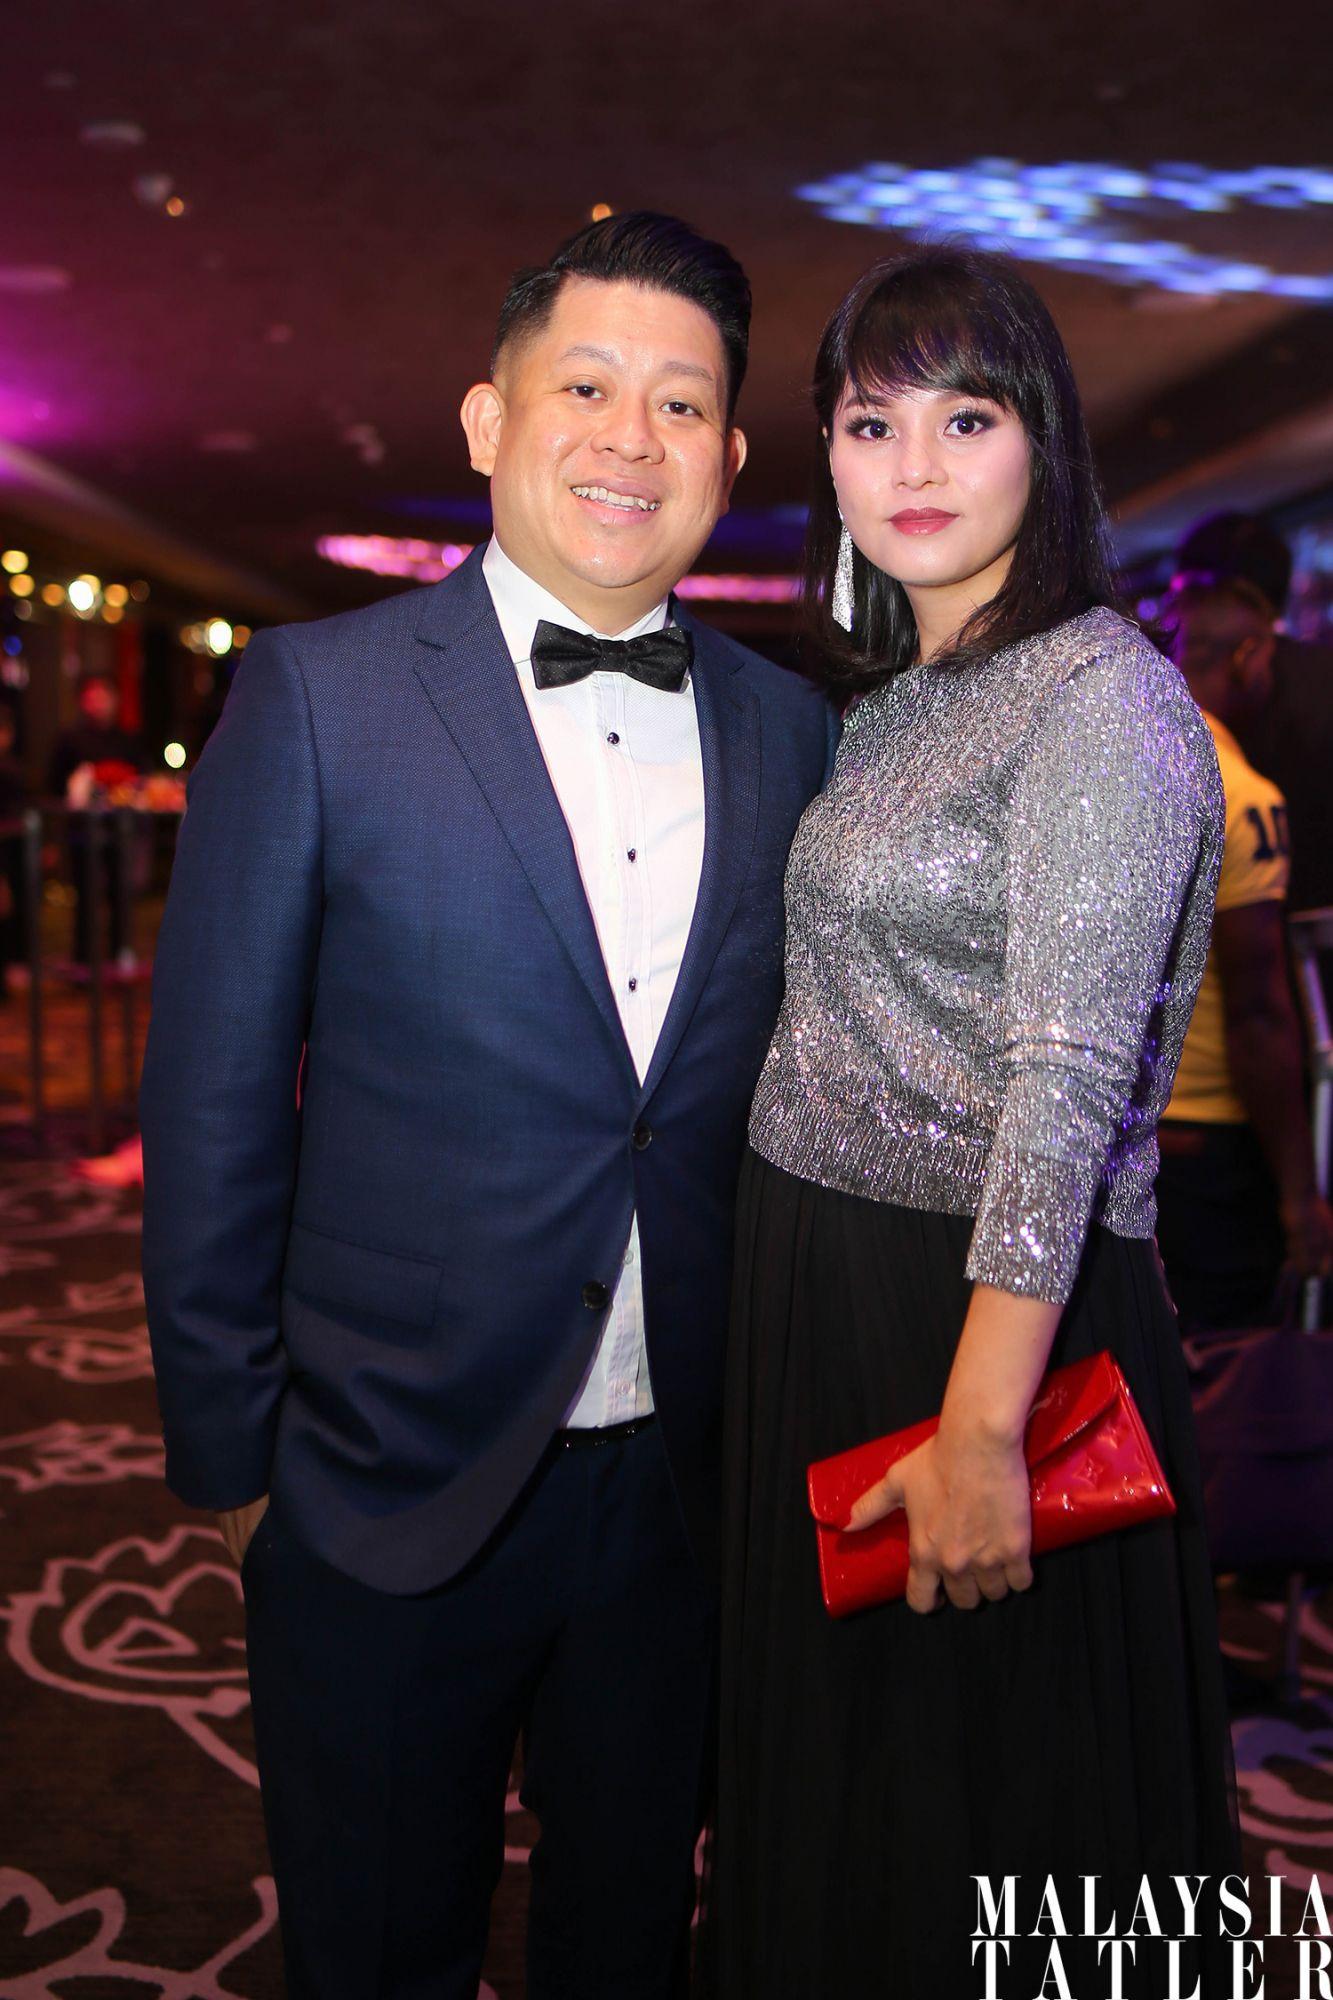 Dato' Jack Yap and Datin May Tan